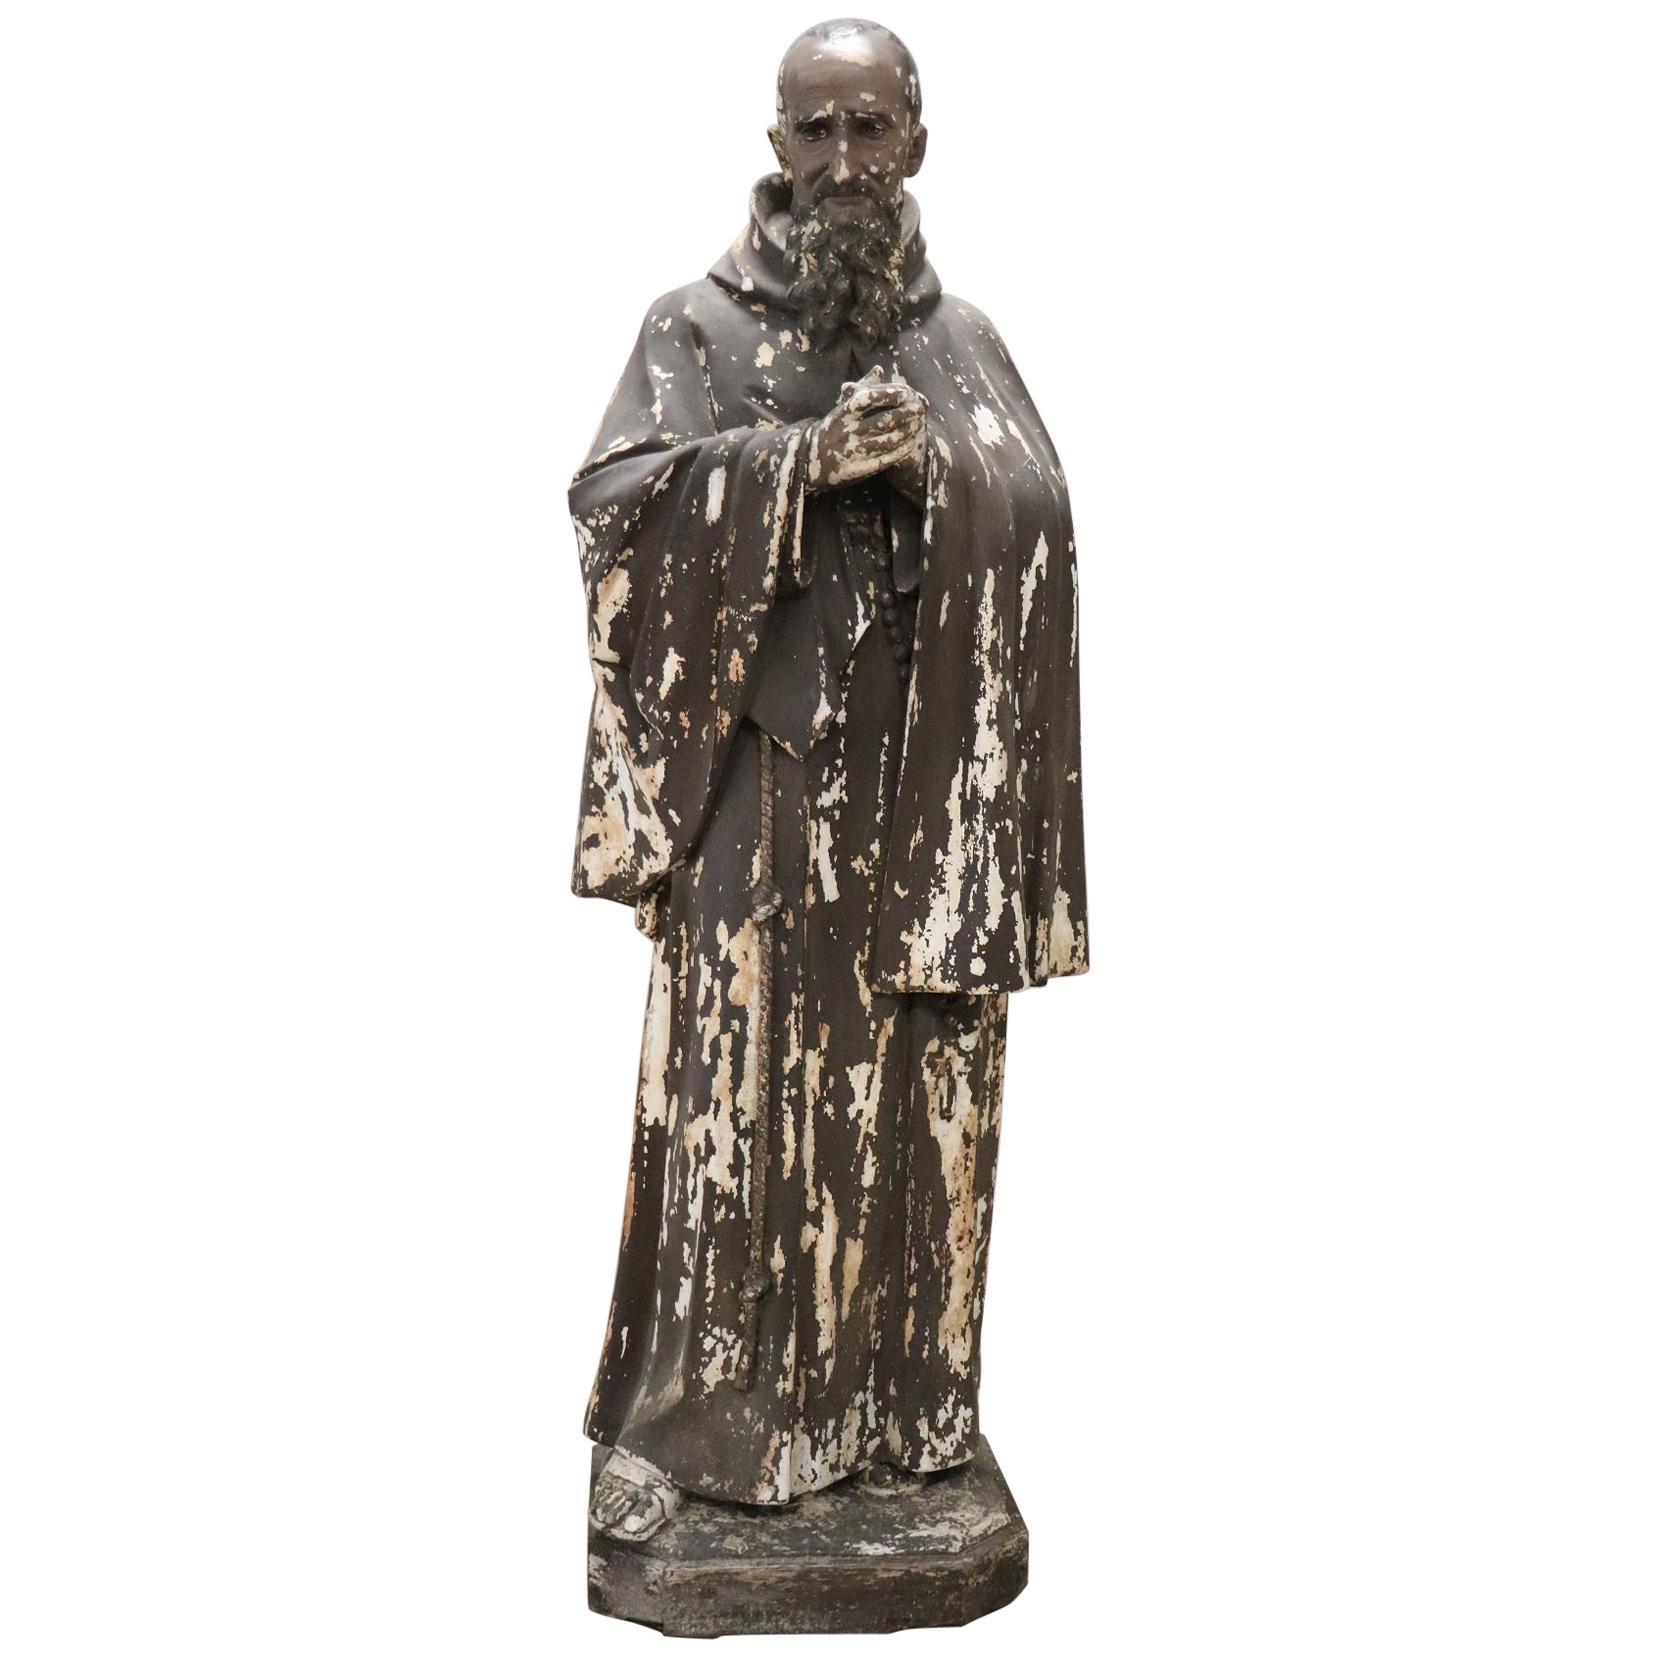 19th Century Italian Sculpture in Plaster Holy Francesco Maria da Camporosso